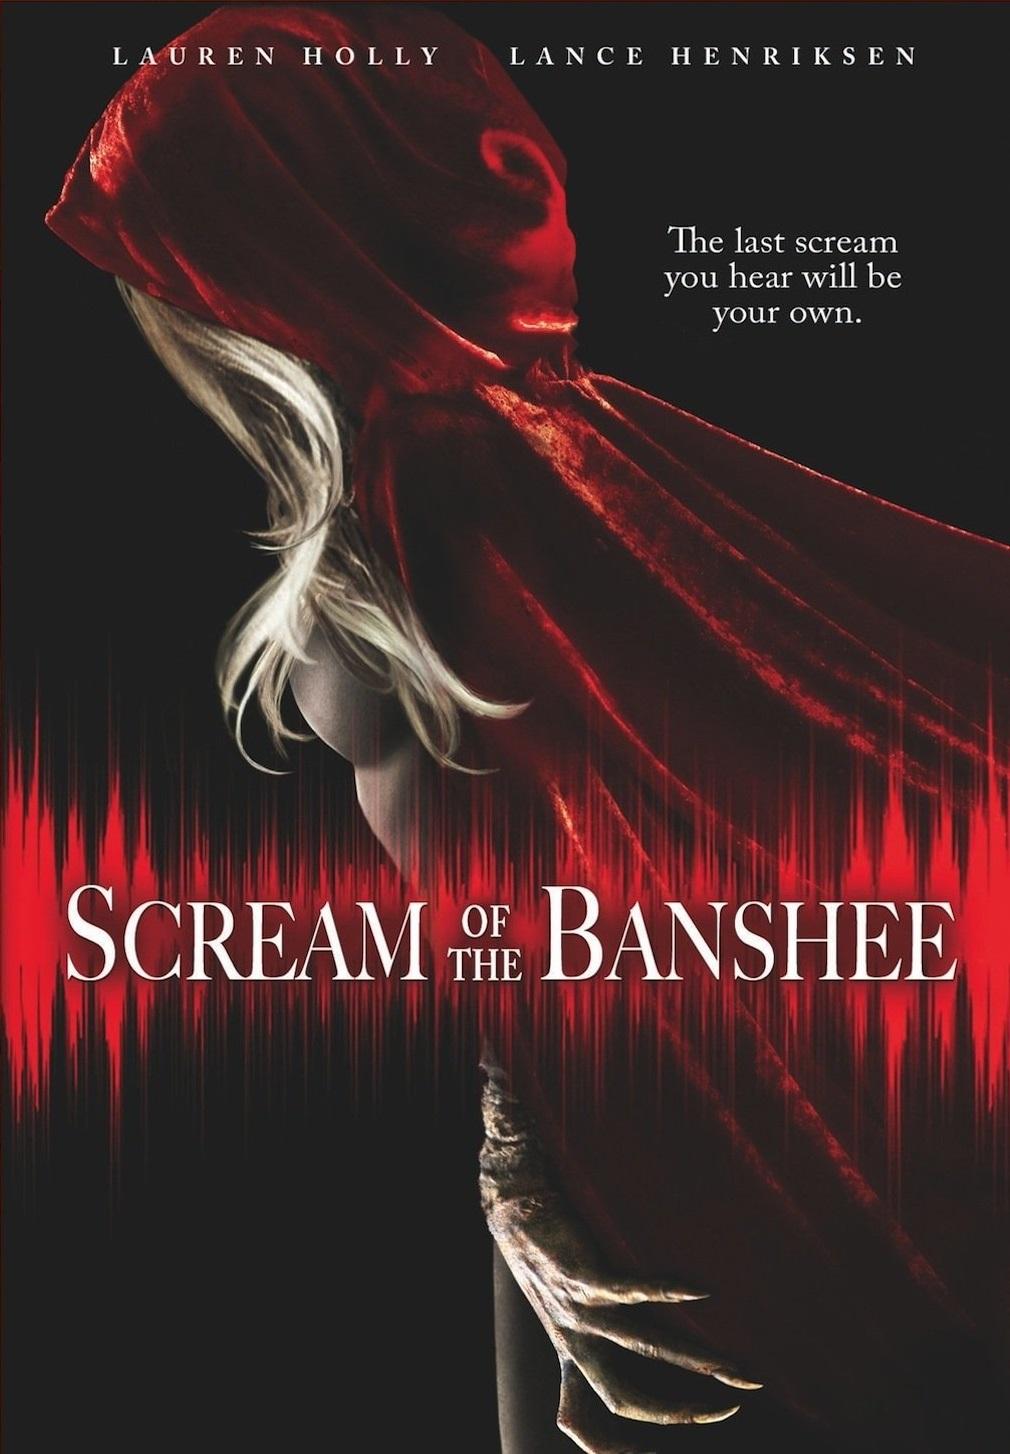 Scream of the Banshee (TV Movie 2011) - IMDb